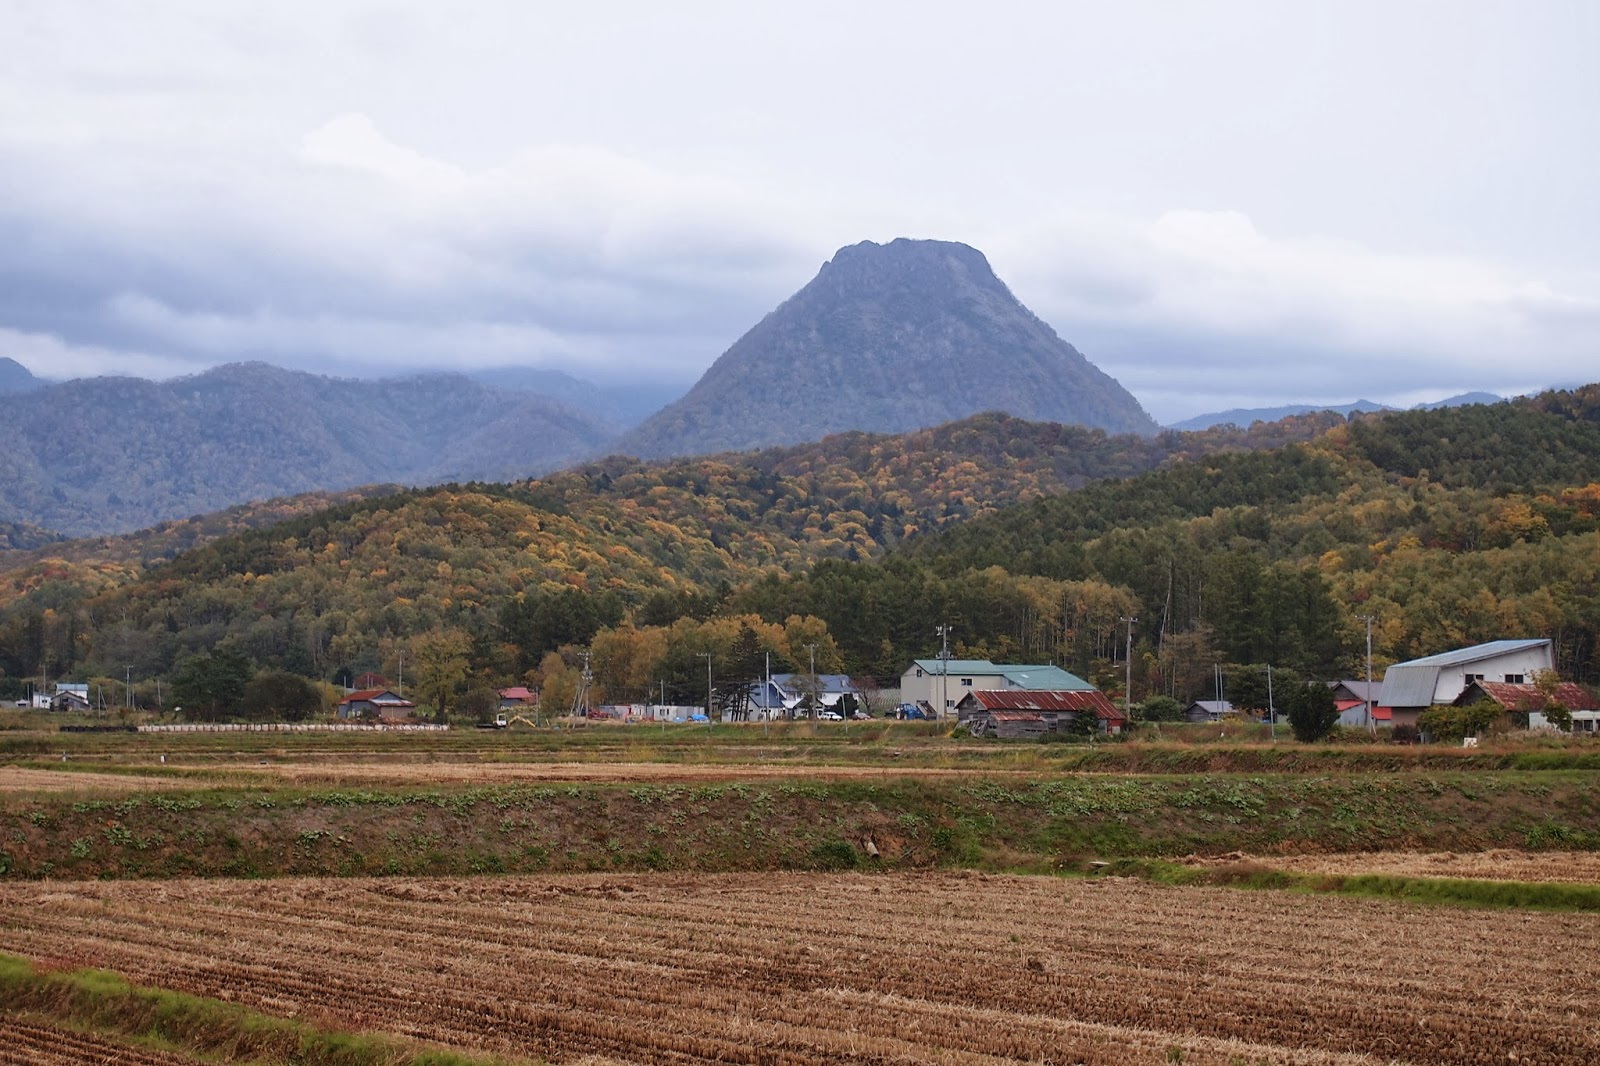 Koganeyama in Hokkaido